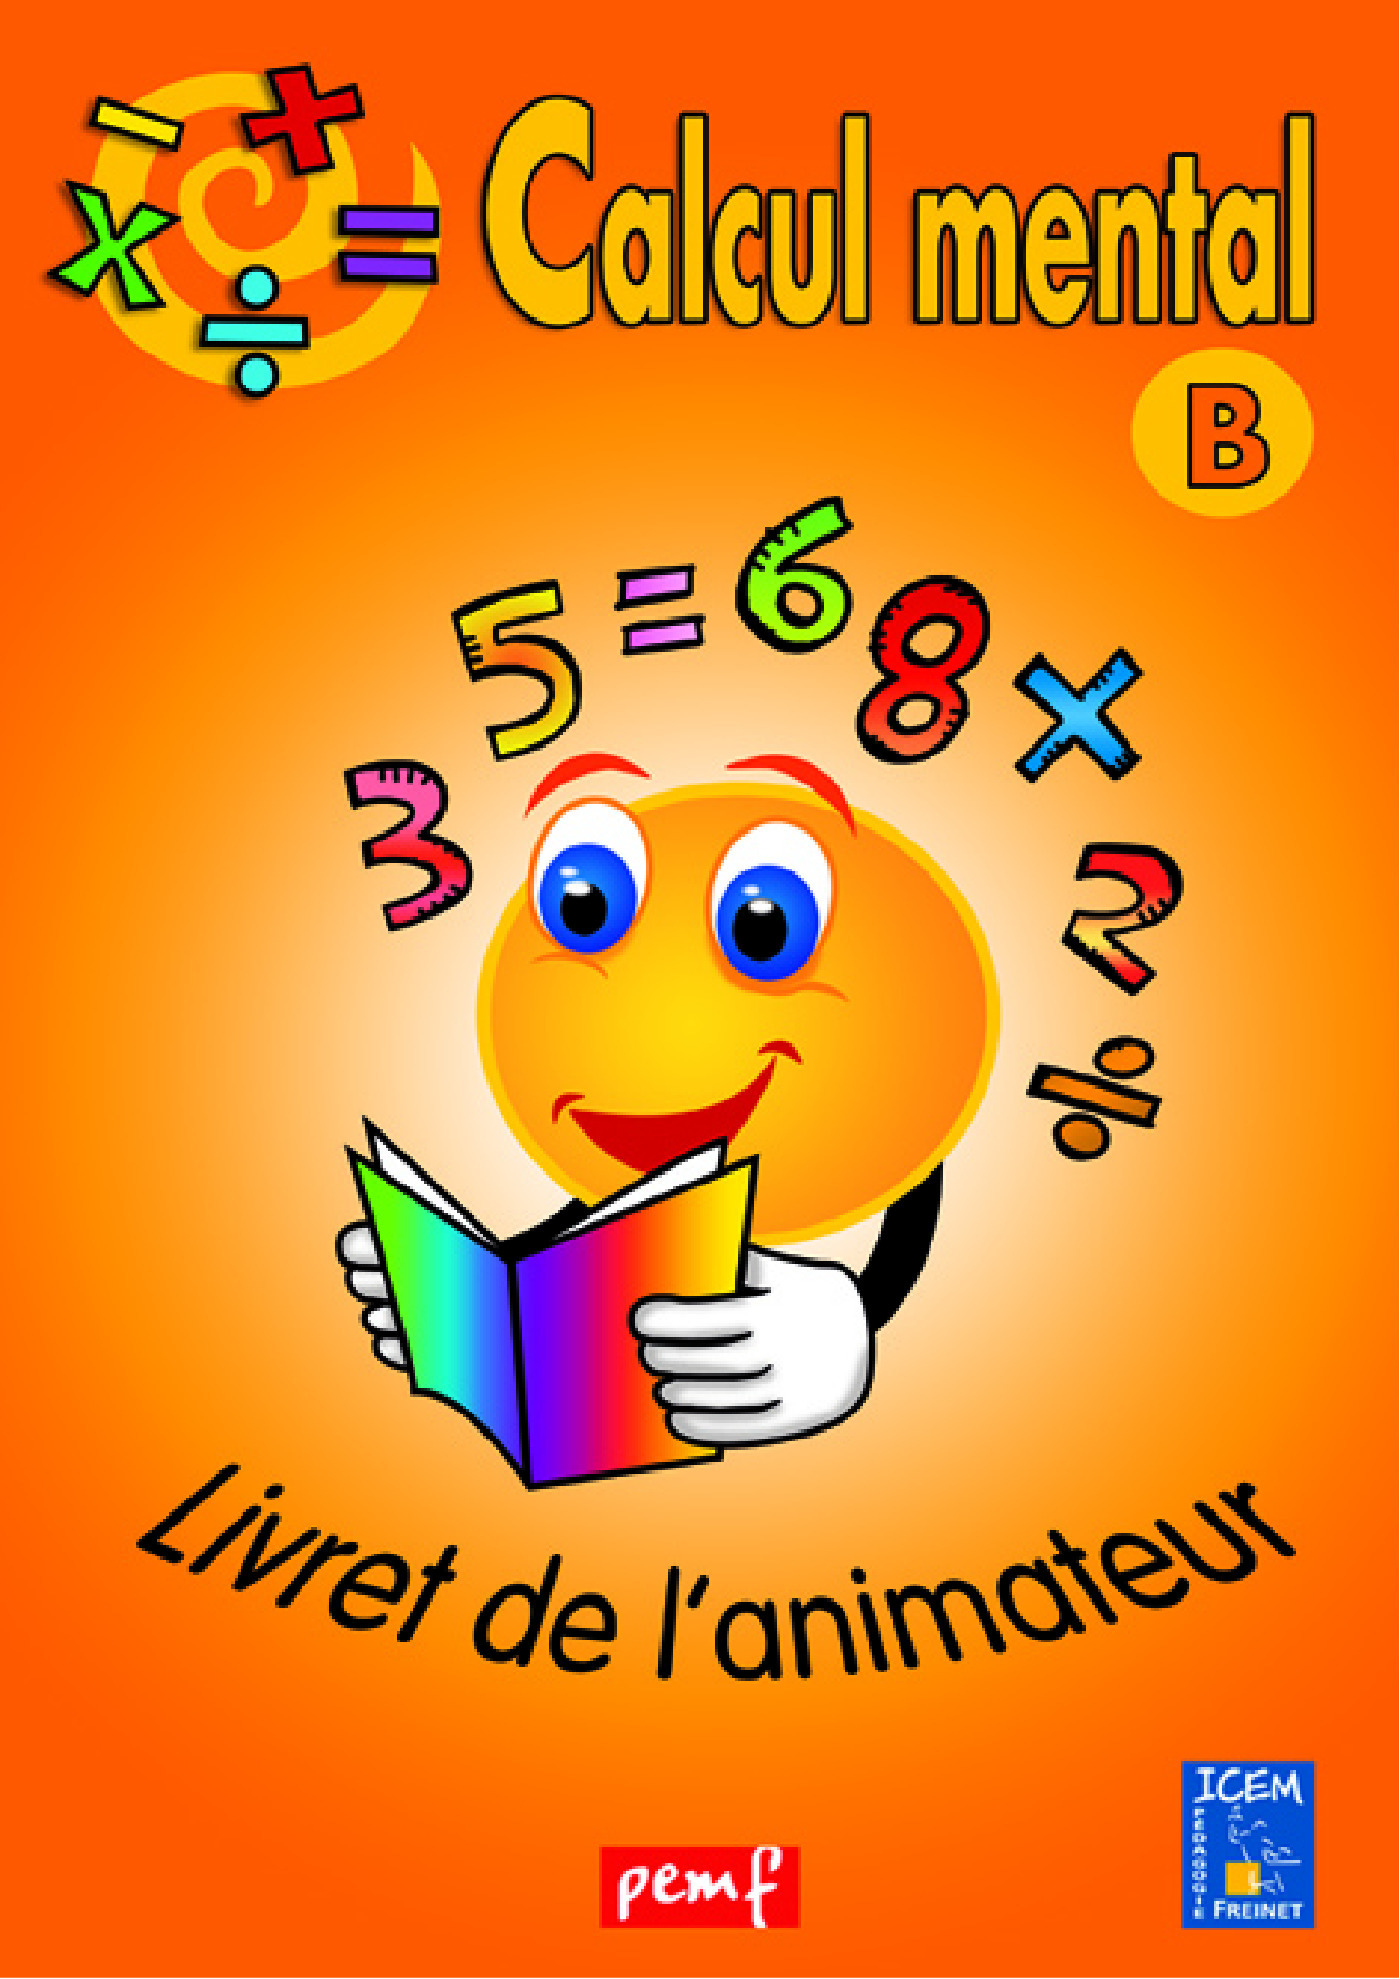 Calcul mental livret animateur b (orange)